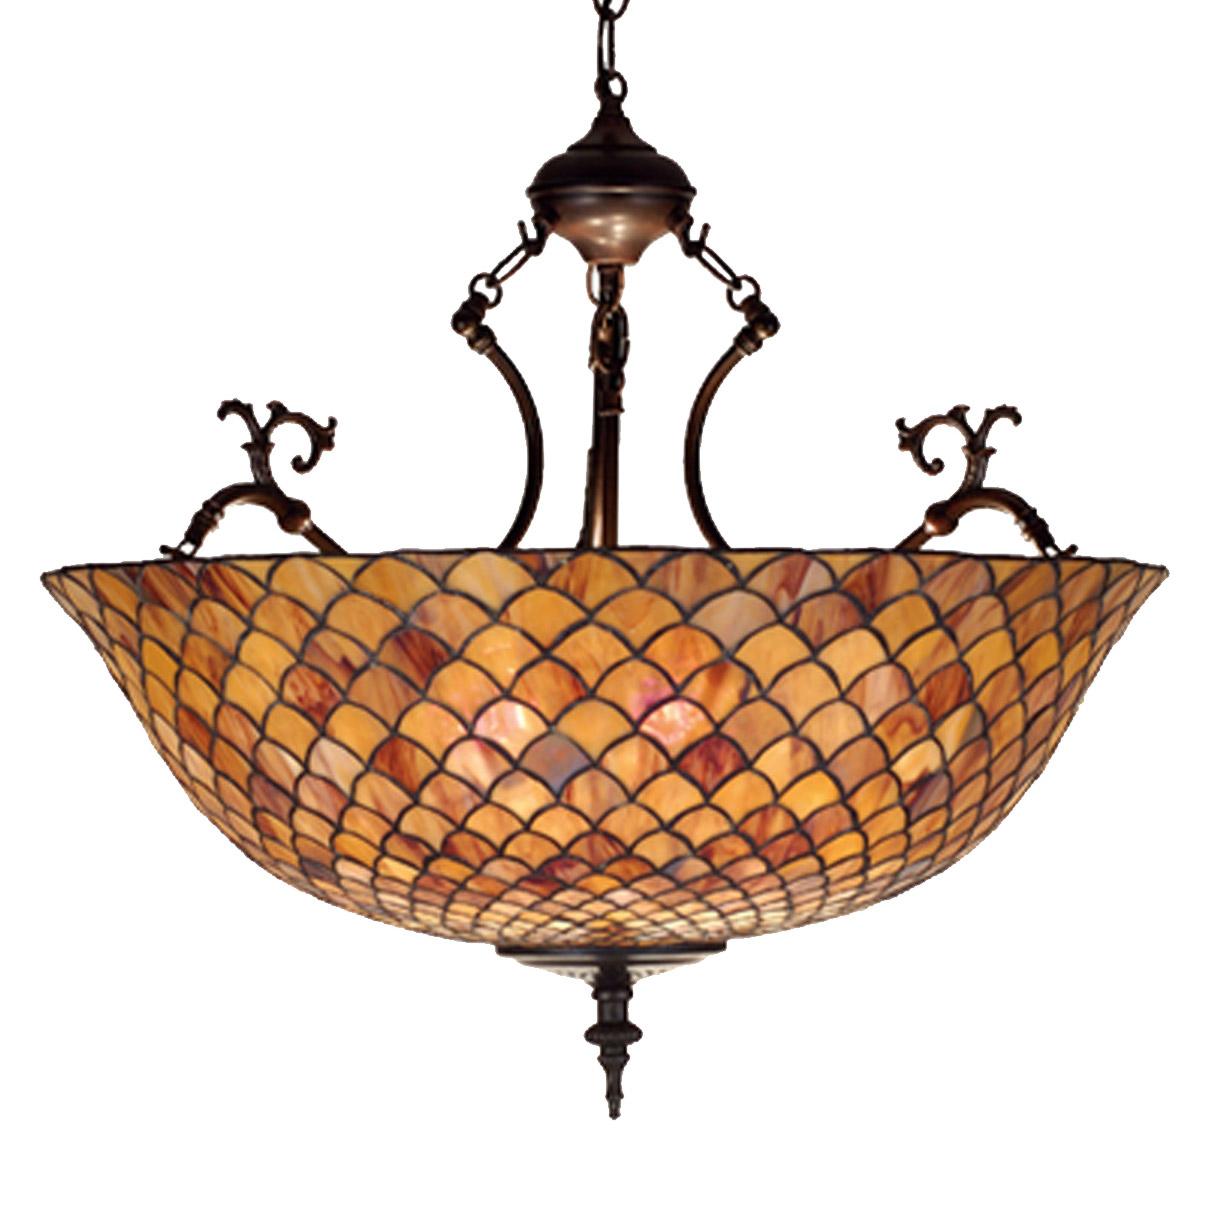 Meyda 67381 Tiffany Fishscale Inverted Hanging Lamp